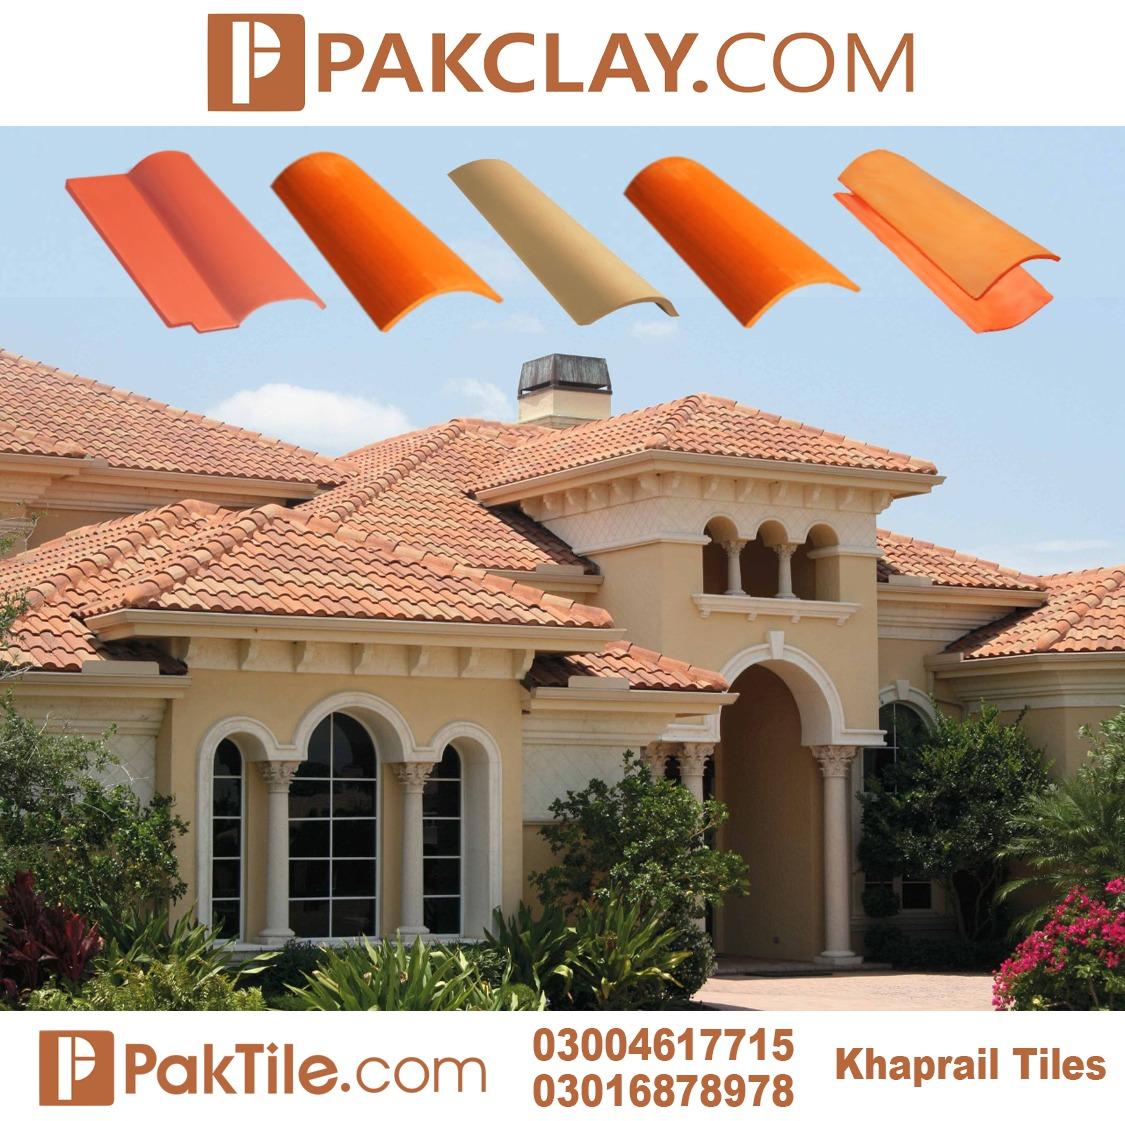 Pak Clay Roof Khaprail Tiles Company in Karachi